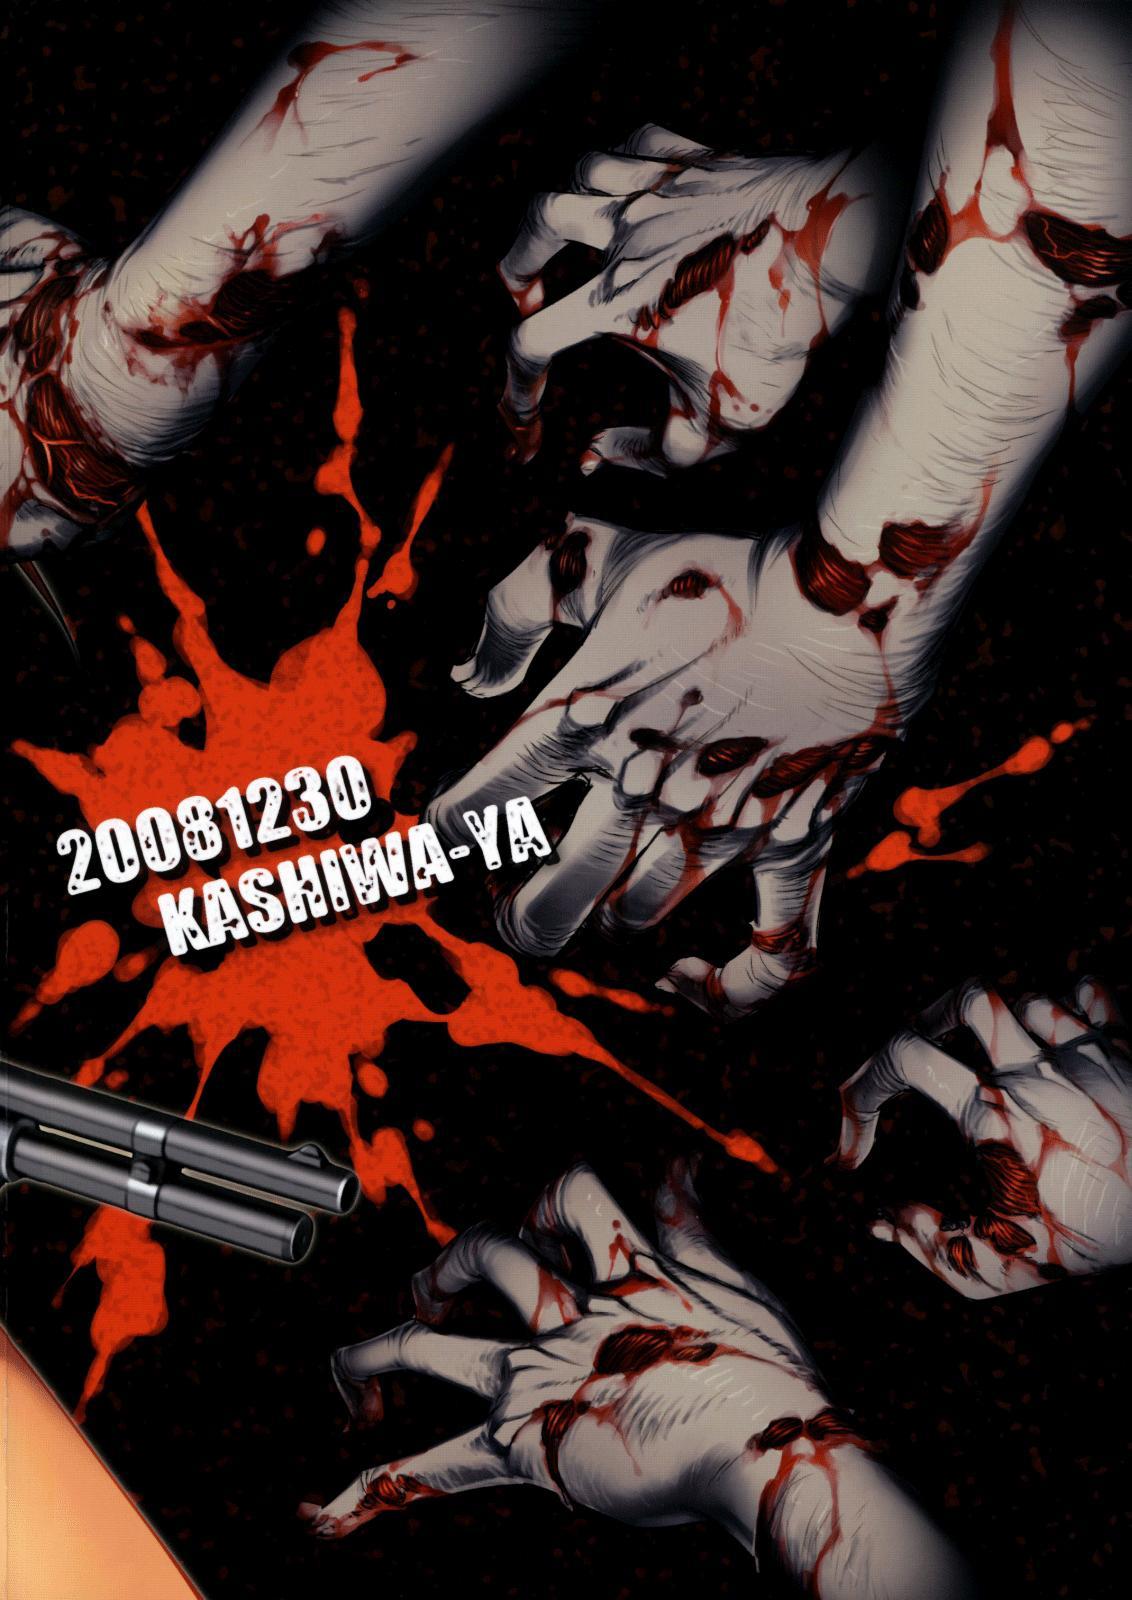 (C75) [Kashiwa-ya (Hiyo Hiyo)] D[O]HOTD3 D.A.T. (HIGHSCHOOL OF THE DEAD) [English] =LWB= 18